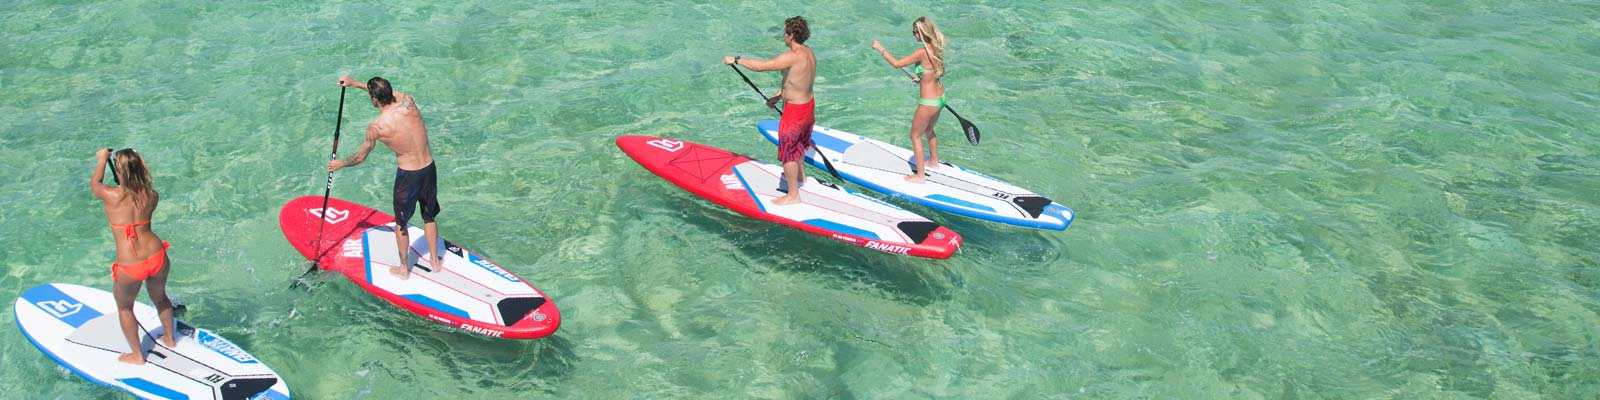 Paddleboard Lessons on St. John, USVI